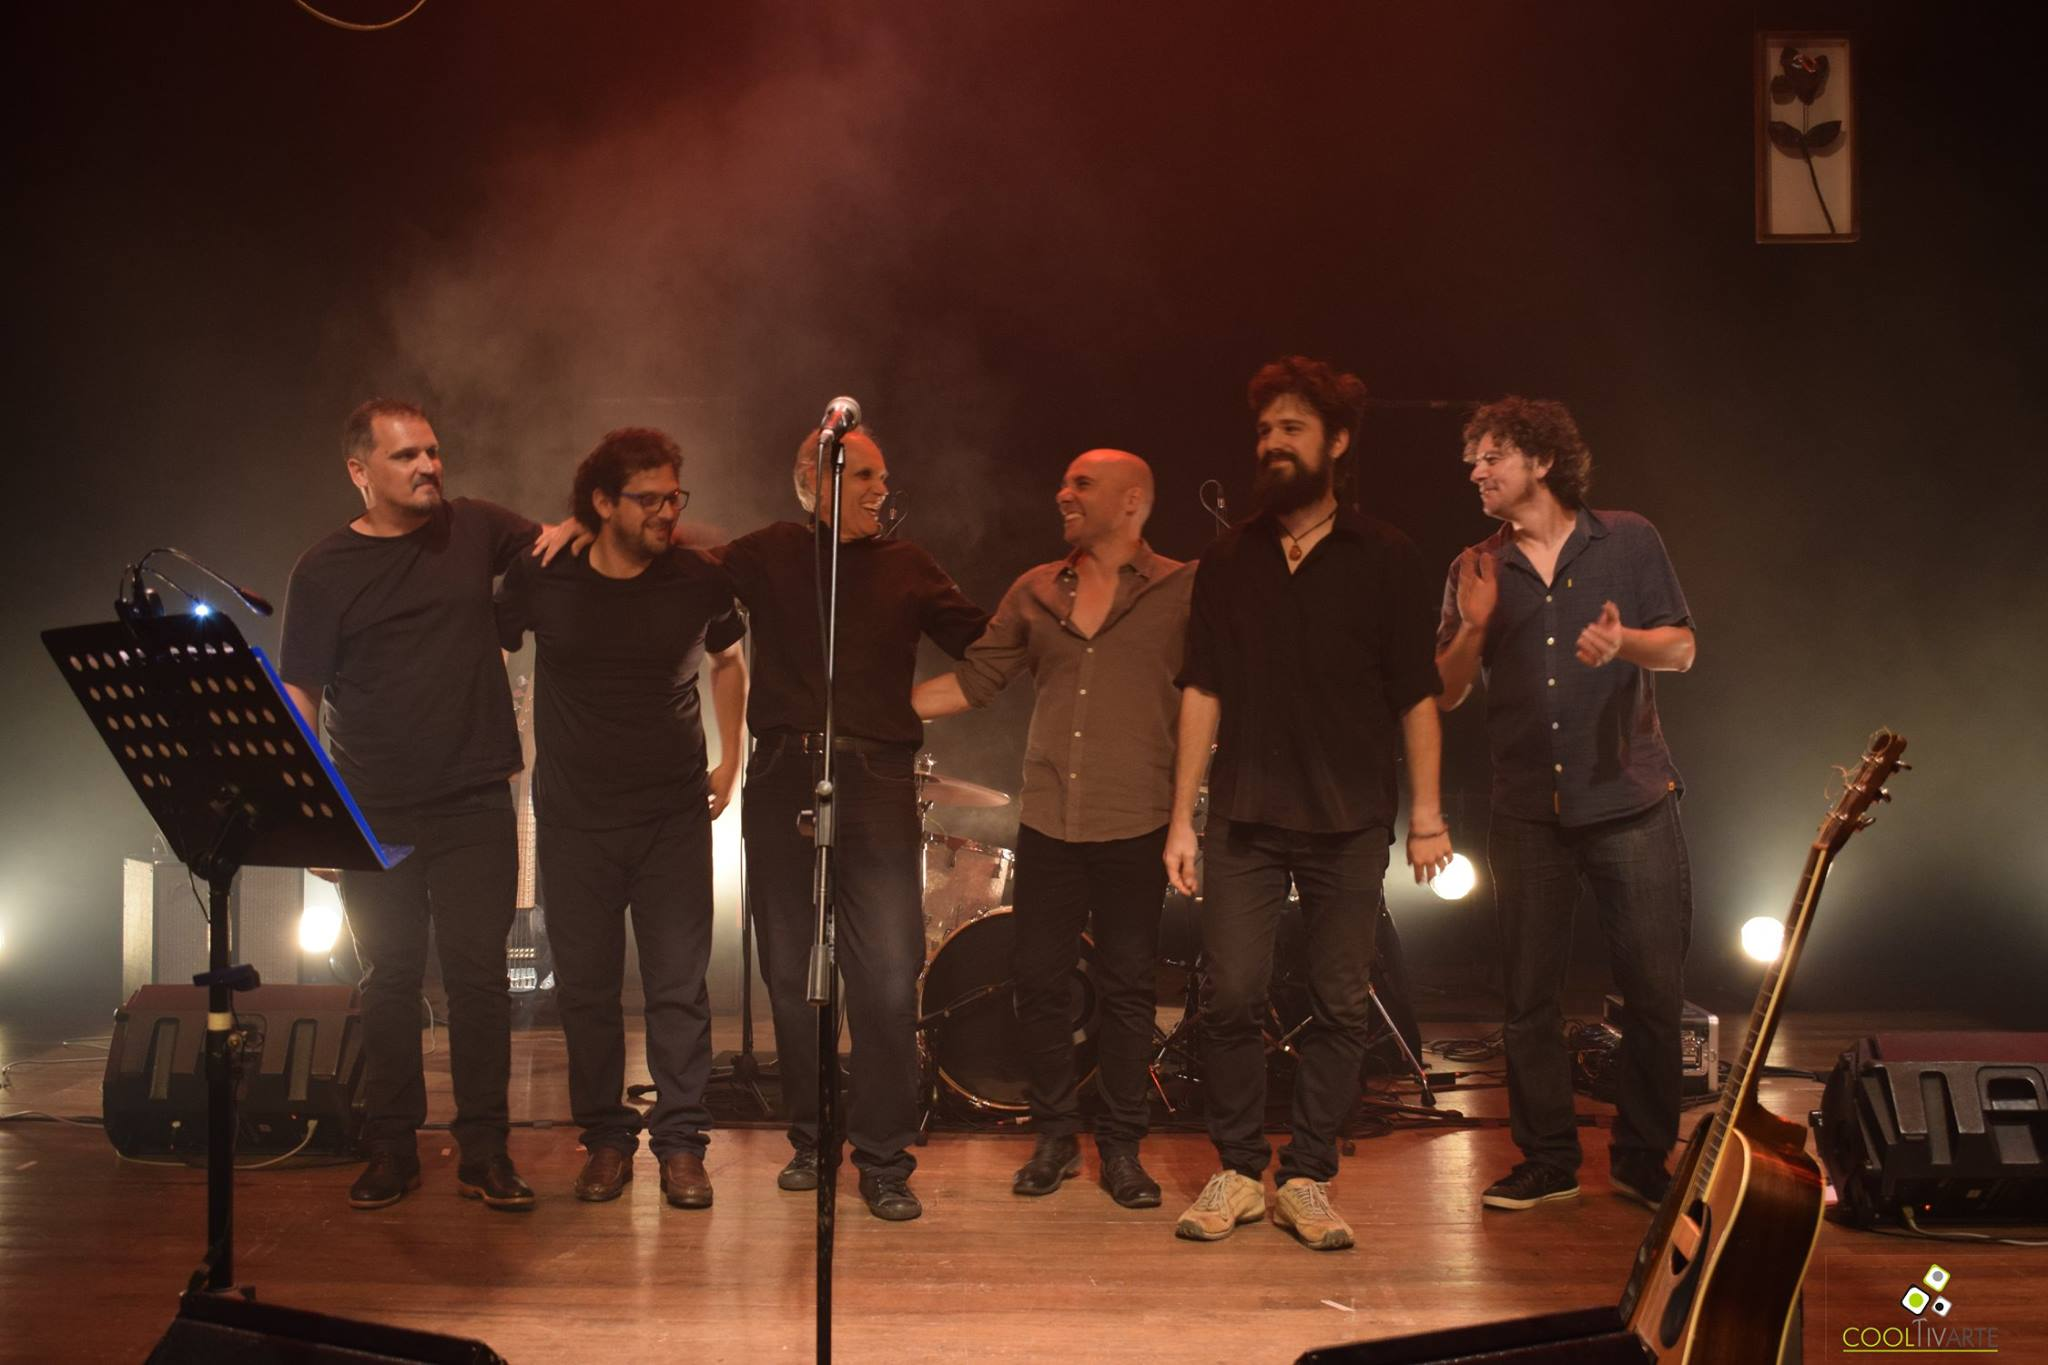 Diego Presa Incendios - Teatro Solís - 20-12-18 - Fotos Claudia Rivero www.cooltivarte.com